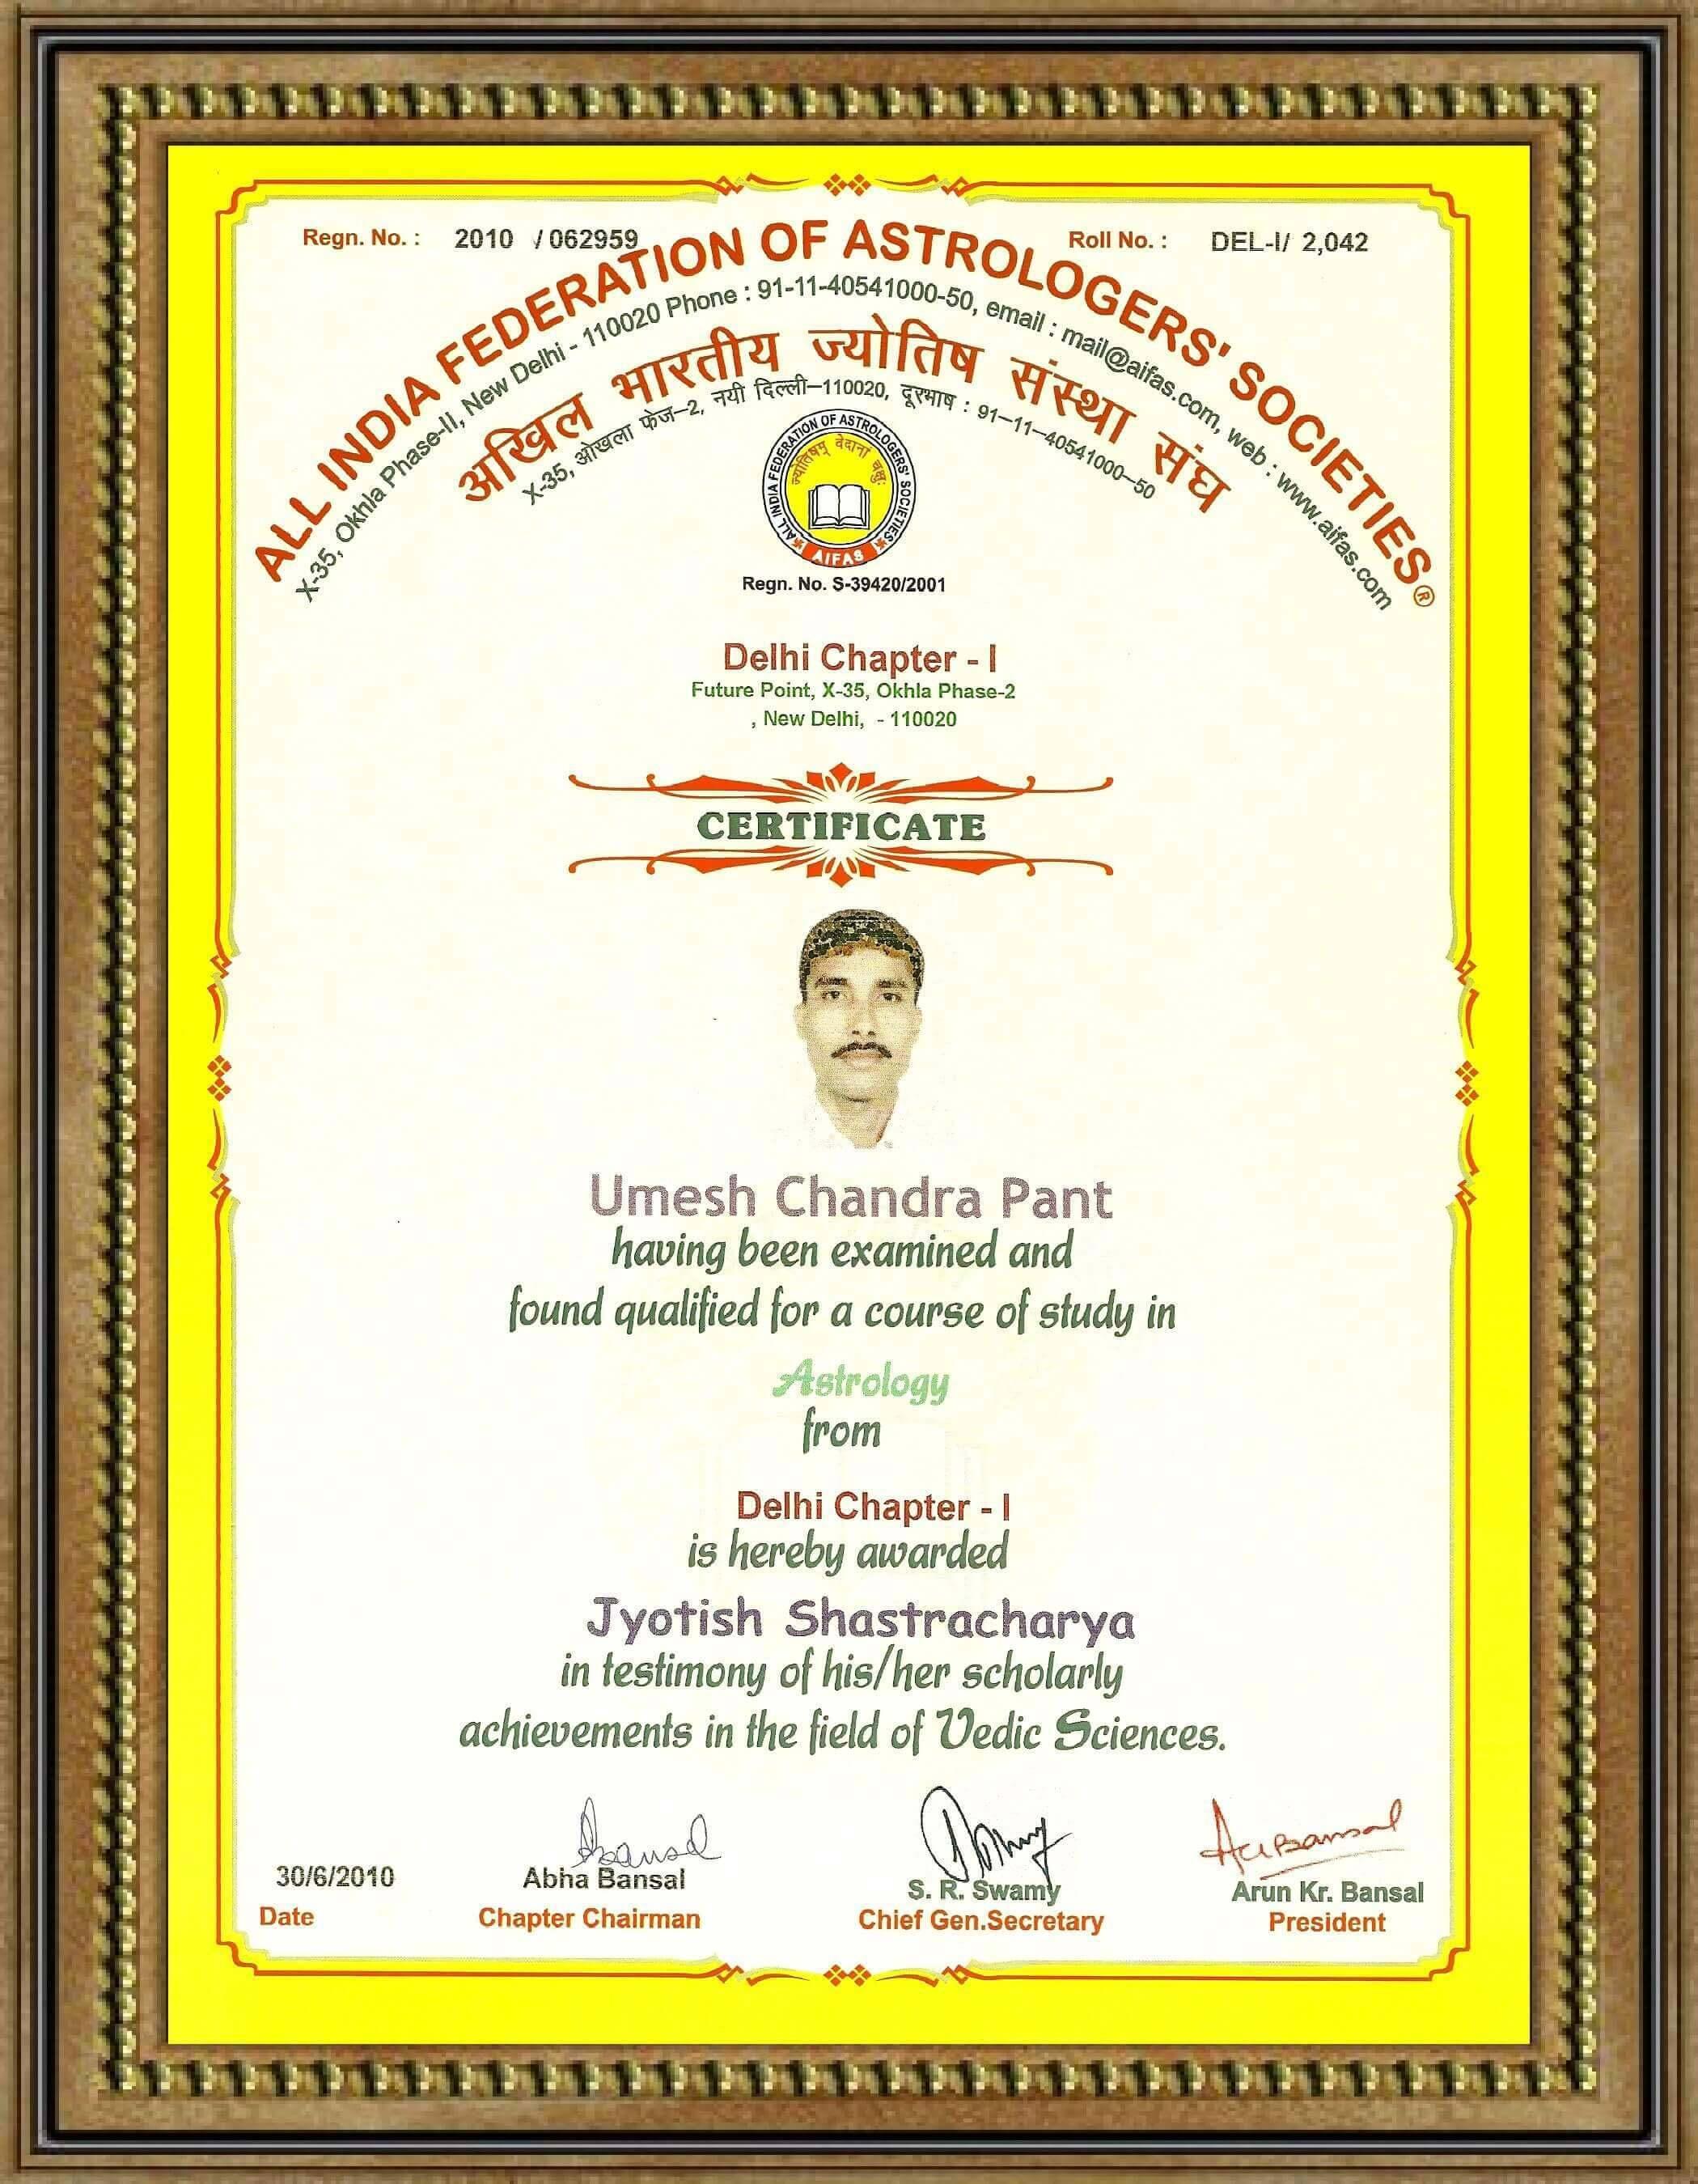 Jyotish Shastracharya